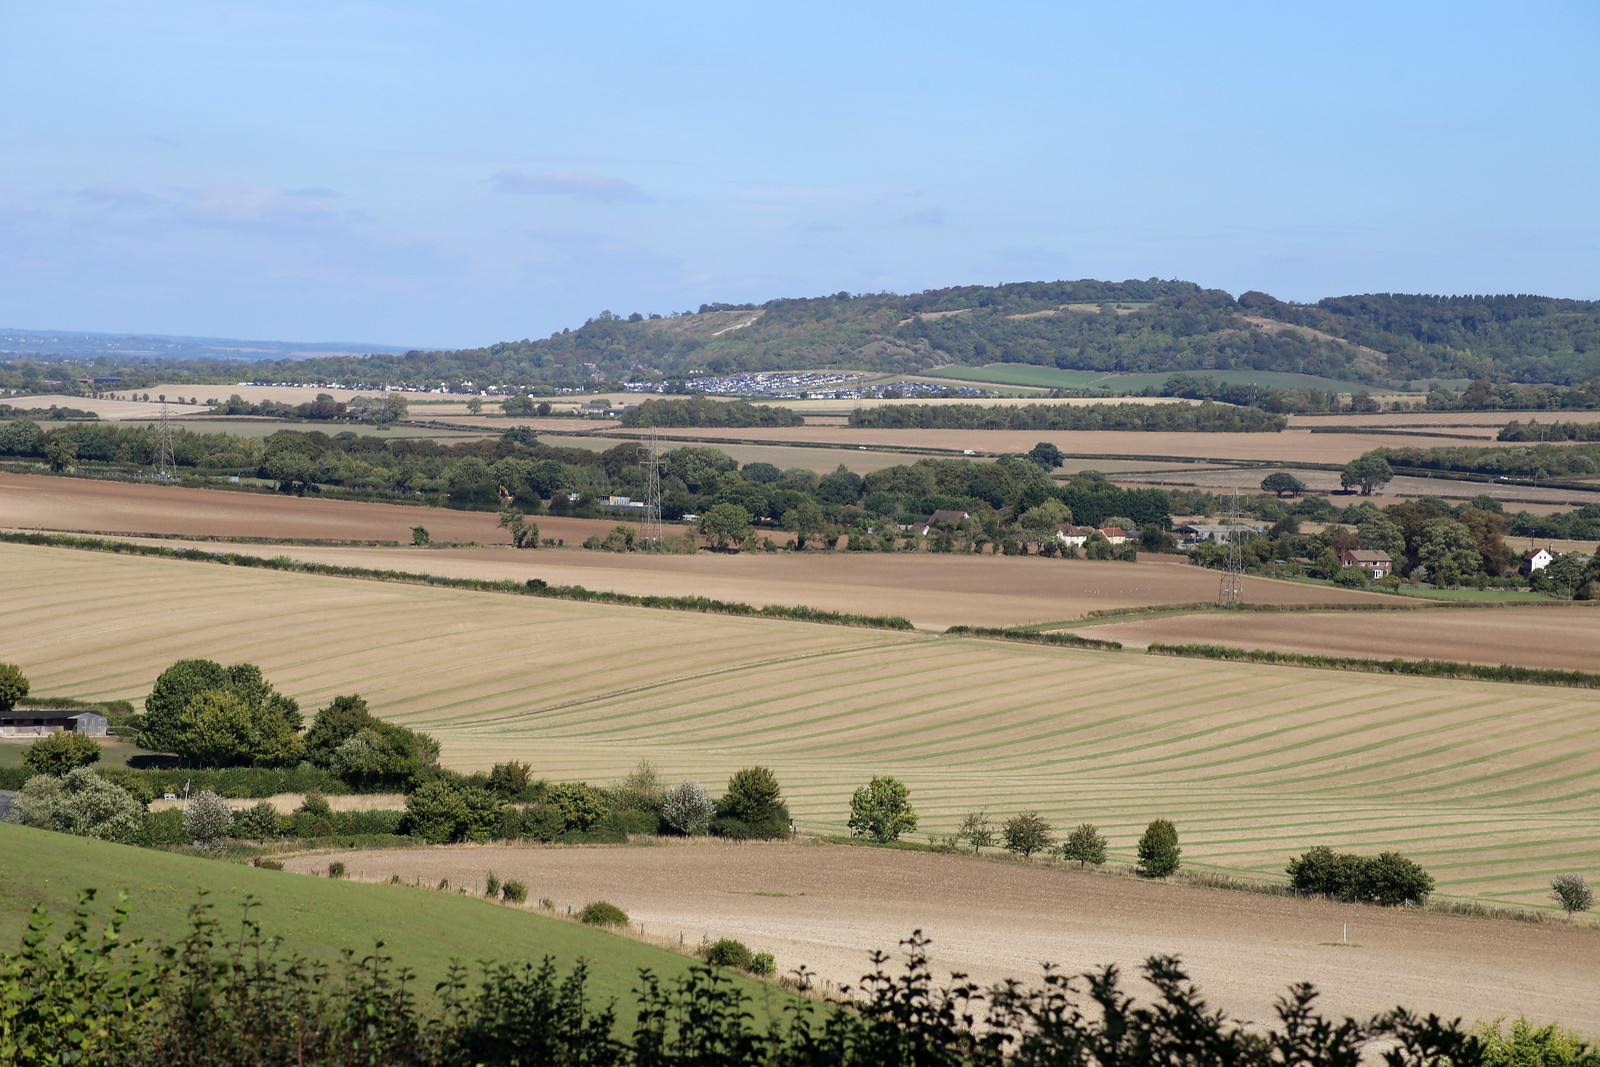 View from Bledlow Ridge